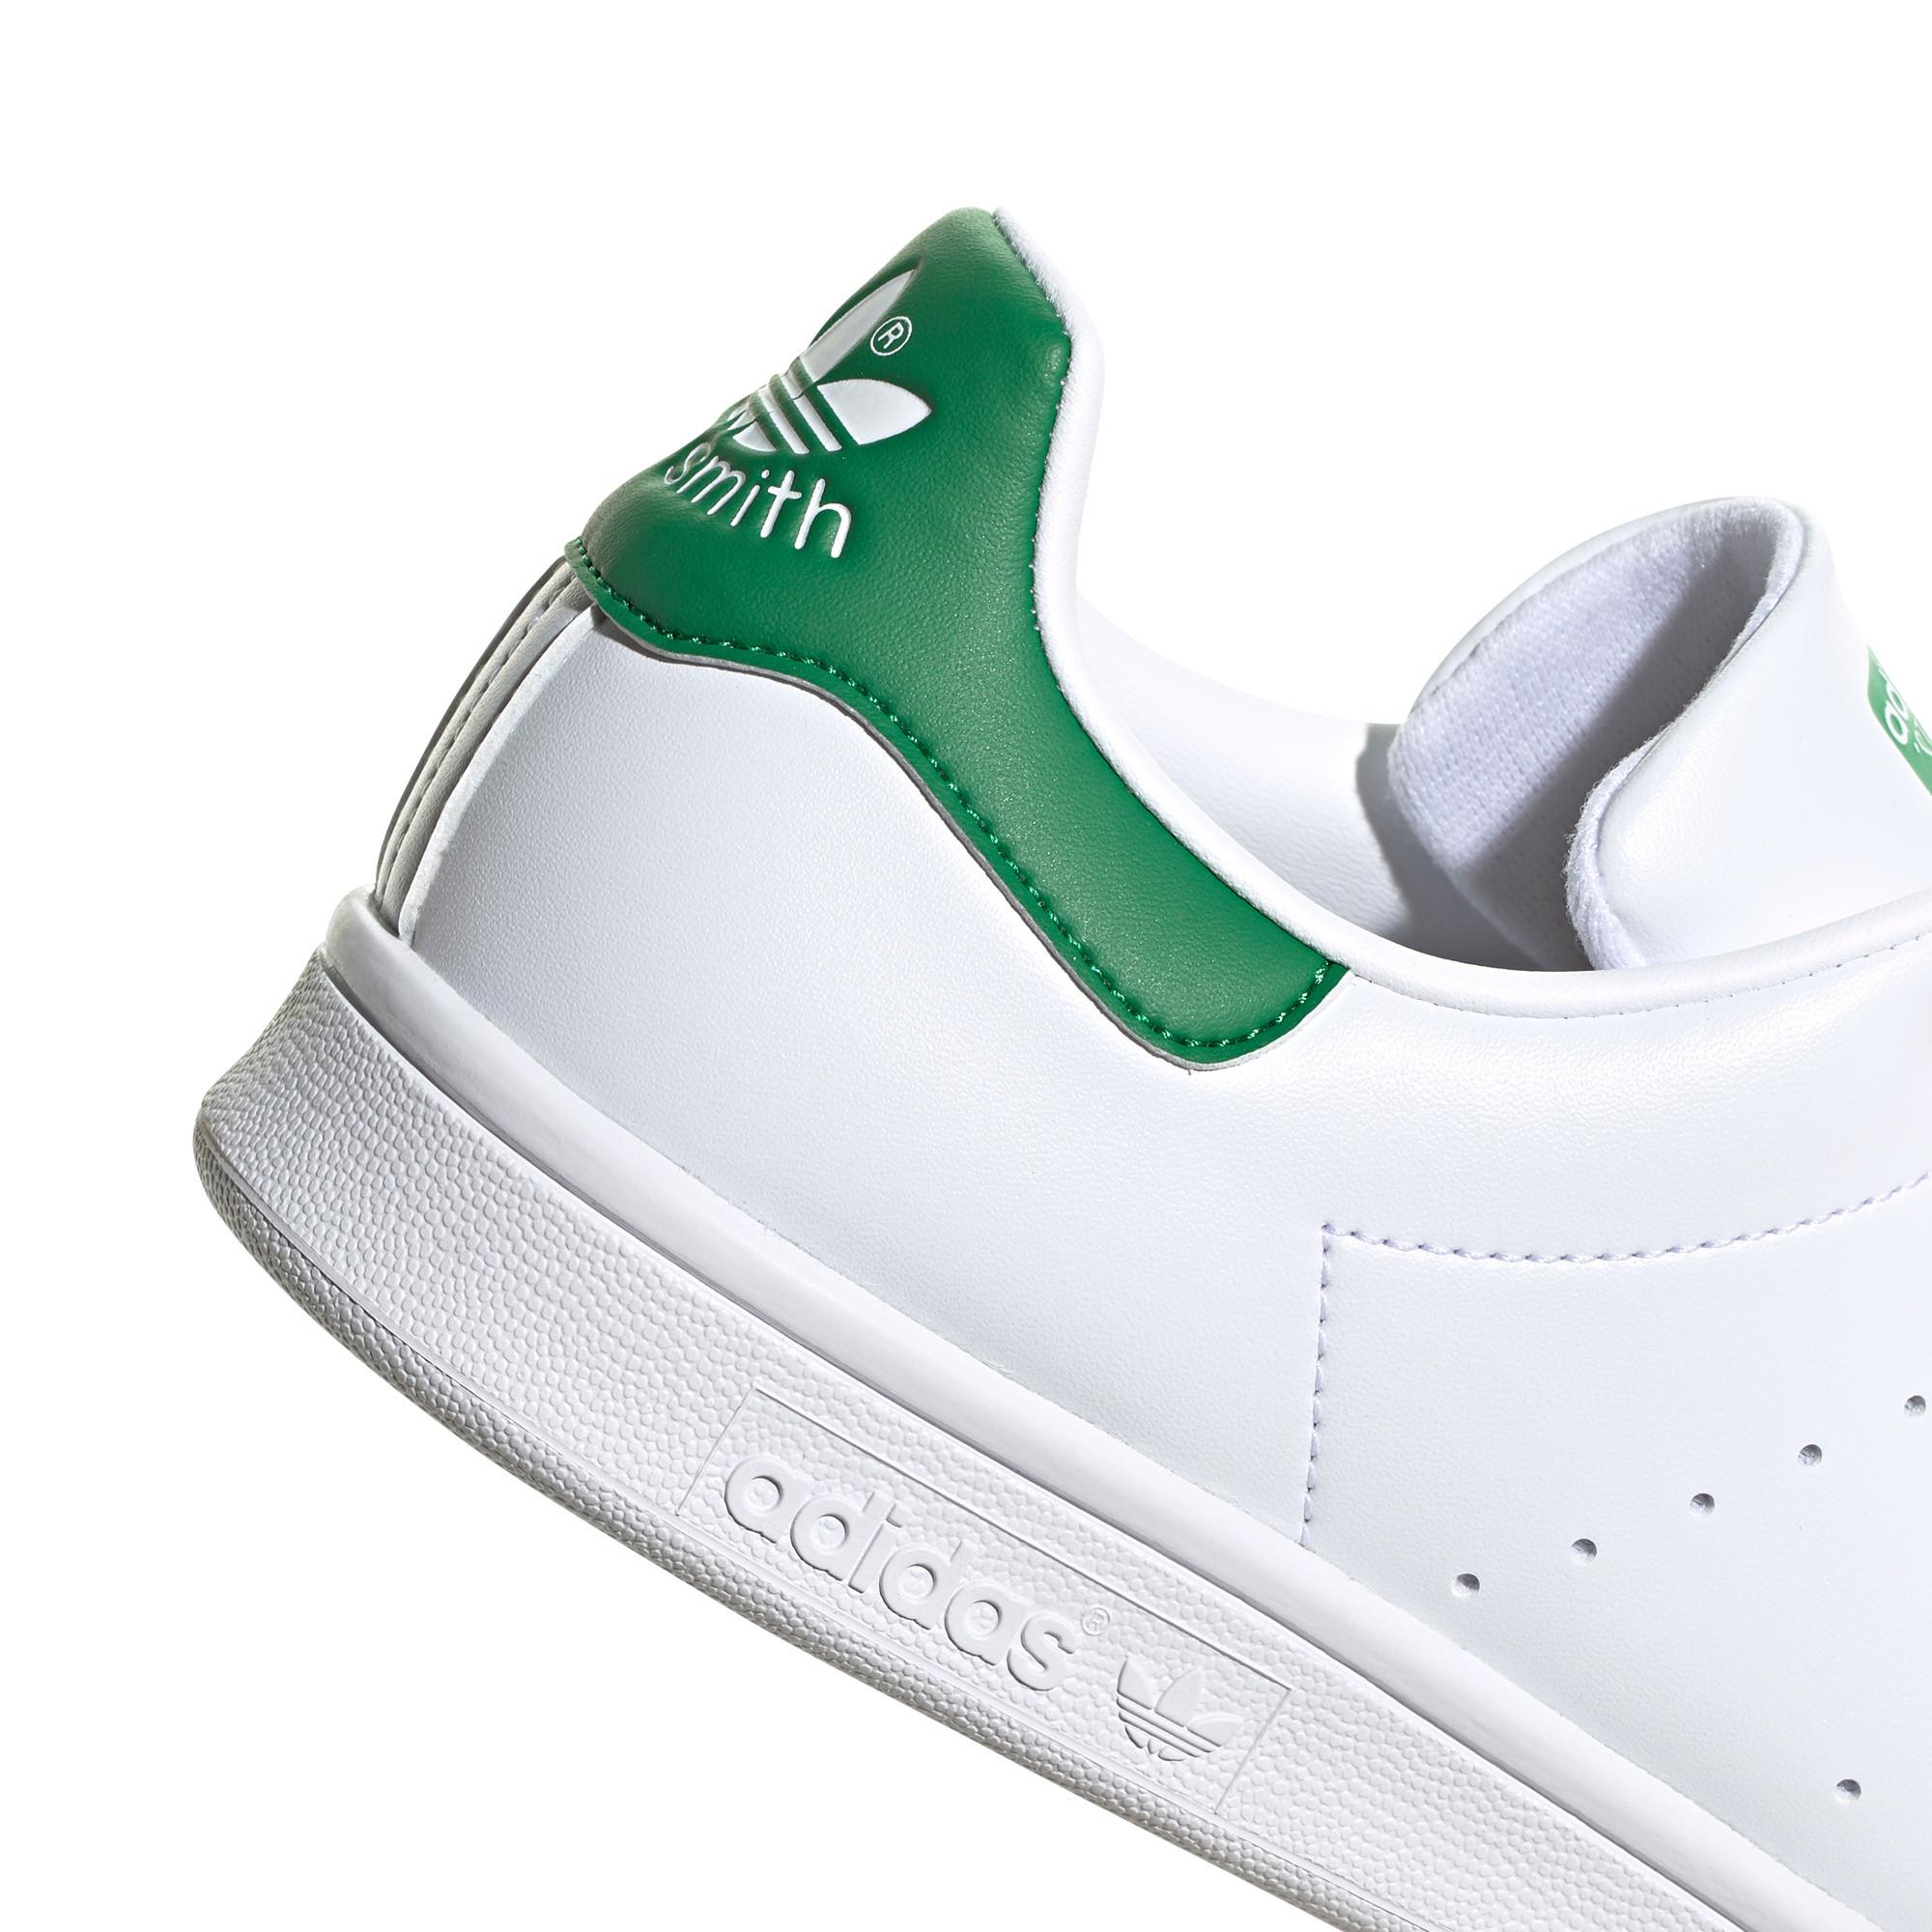 Stan Smith uomo, Bianco/Verde, large image number 7